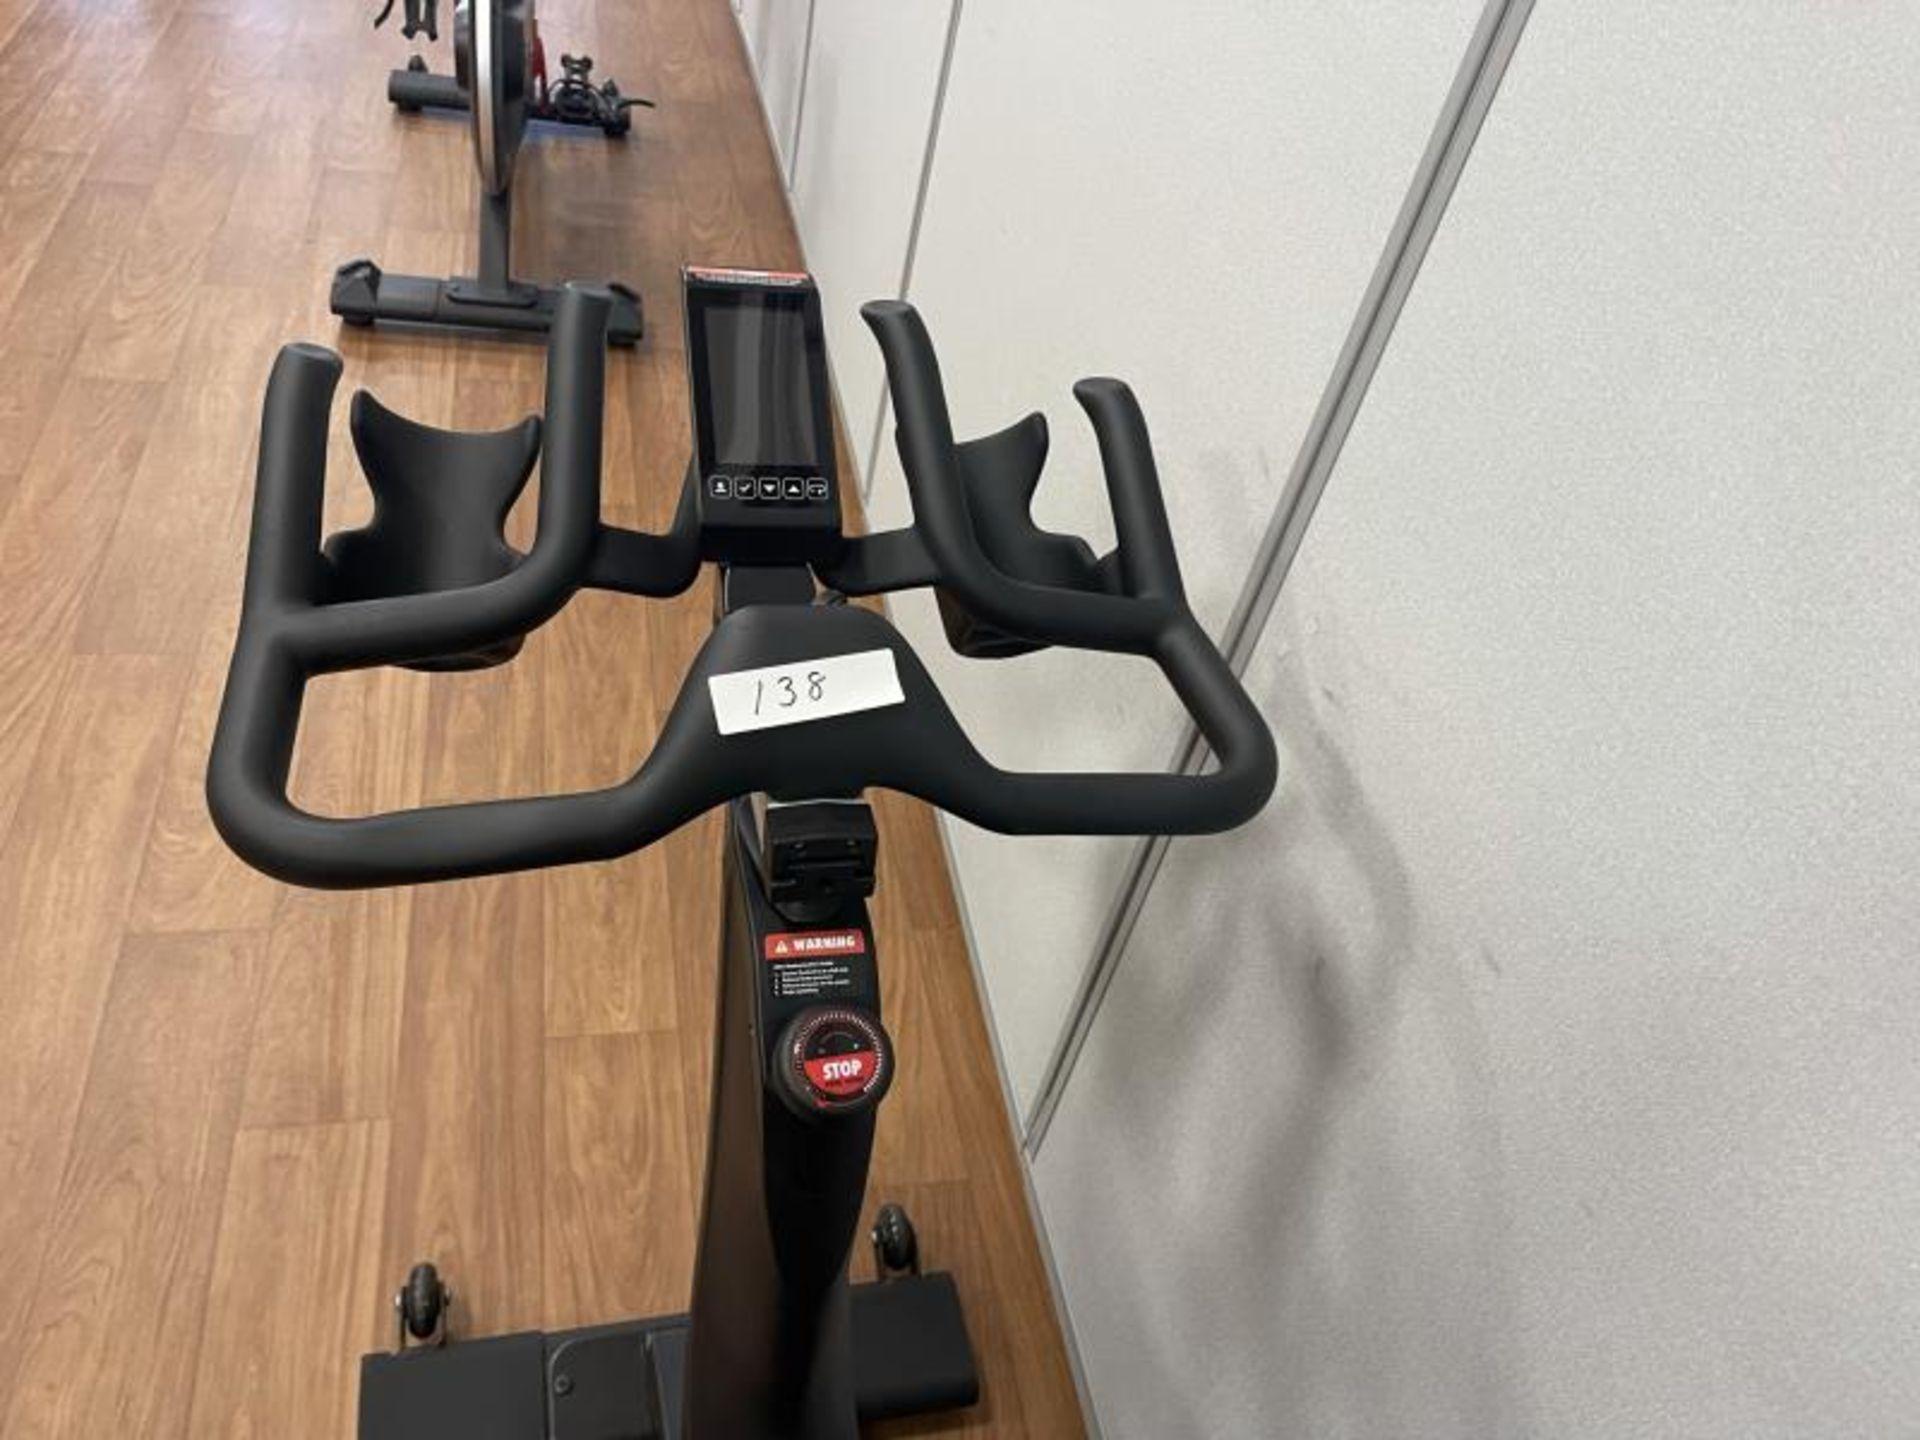 2018 Life Fitness IC7 Spin Bike M: IC-LFIC7B2-01 - Image 3 of 3